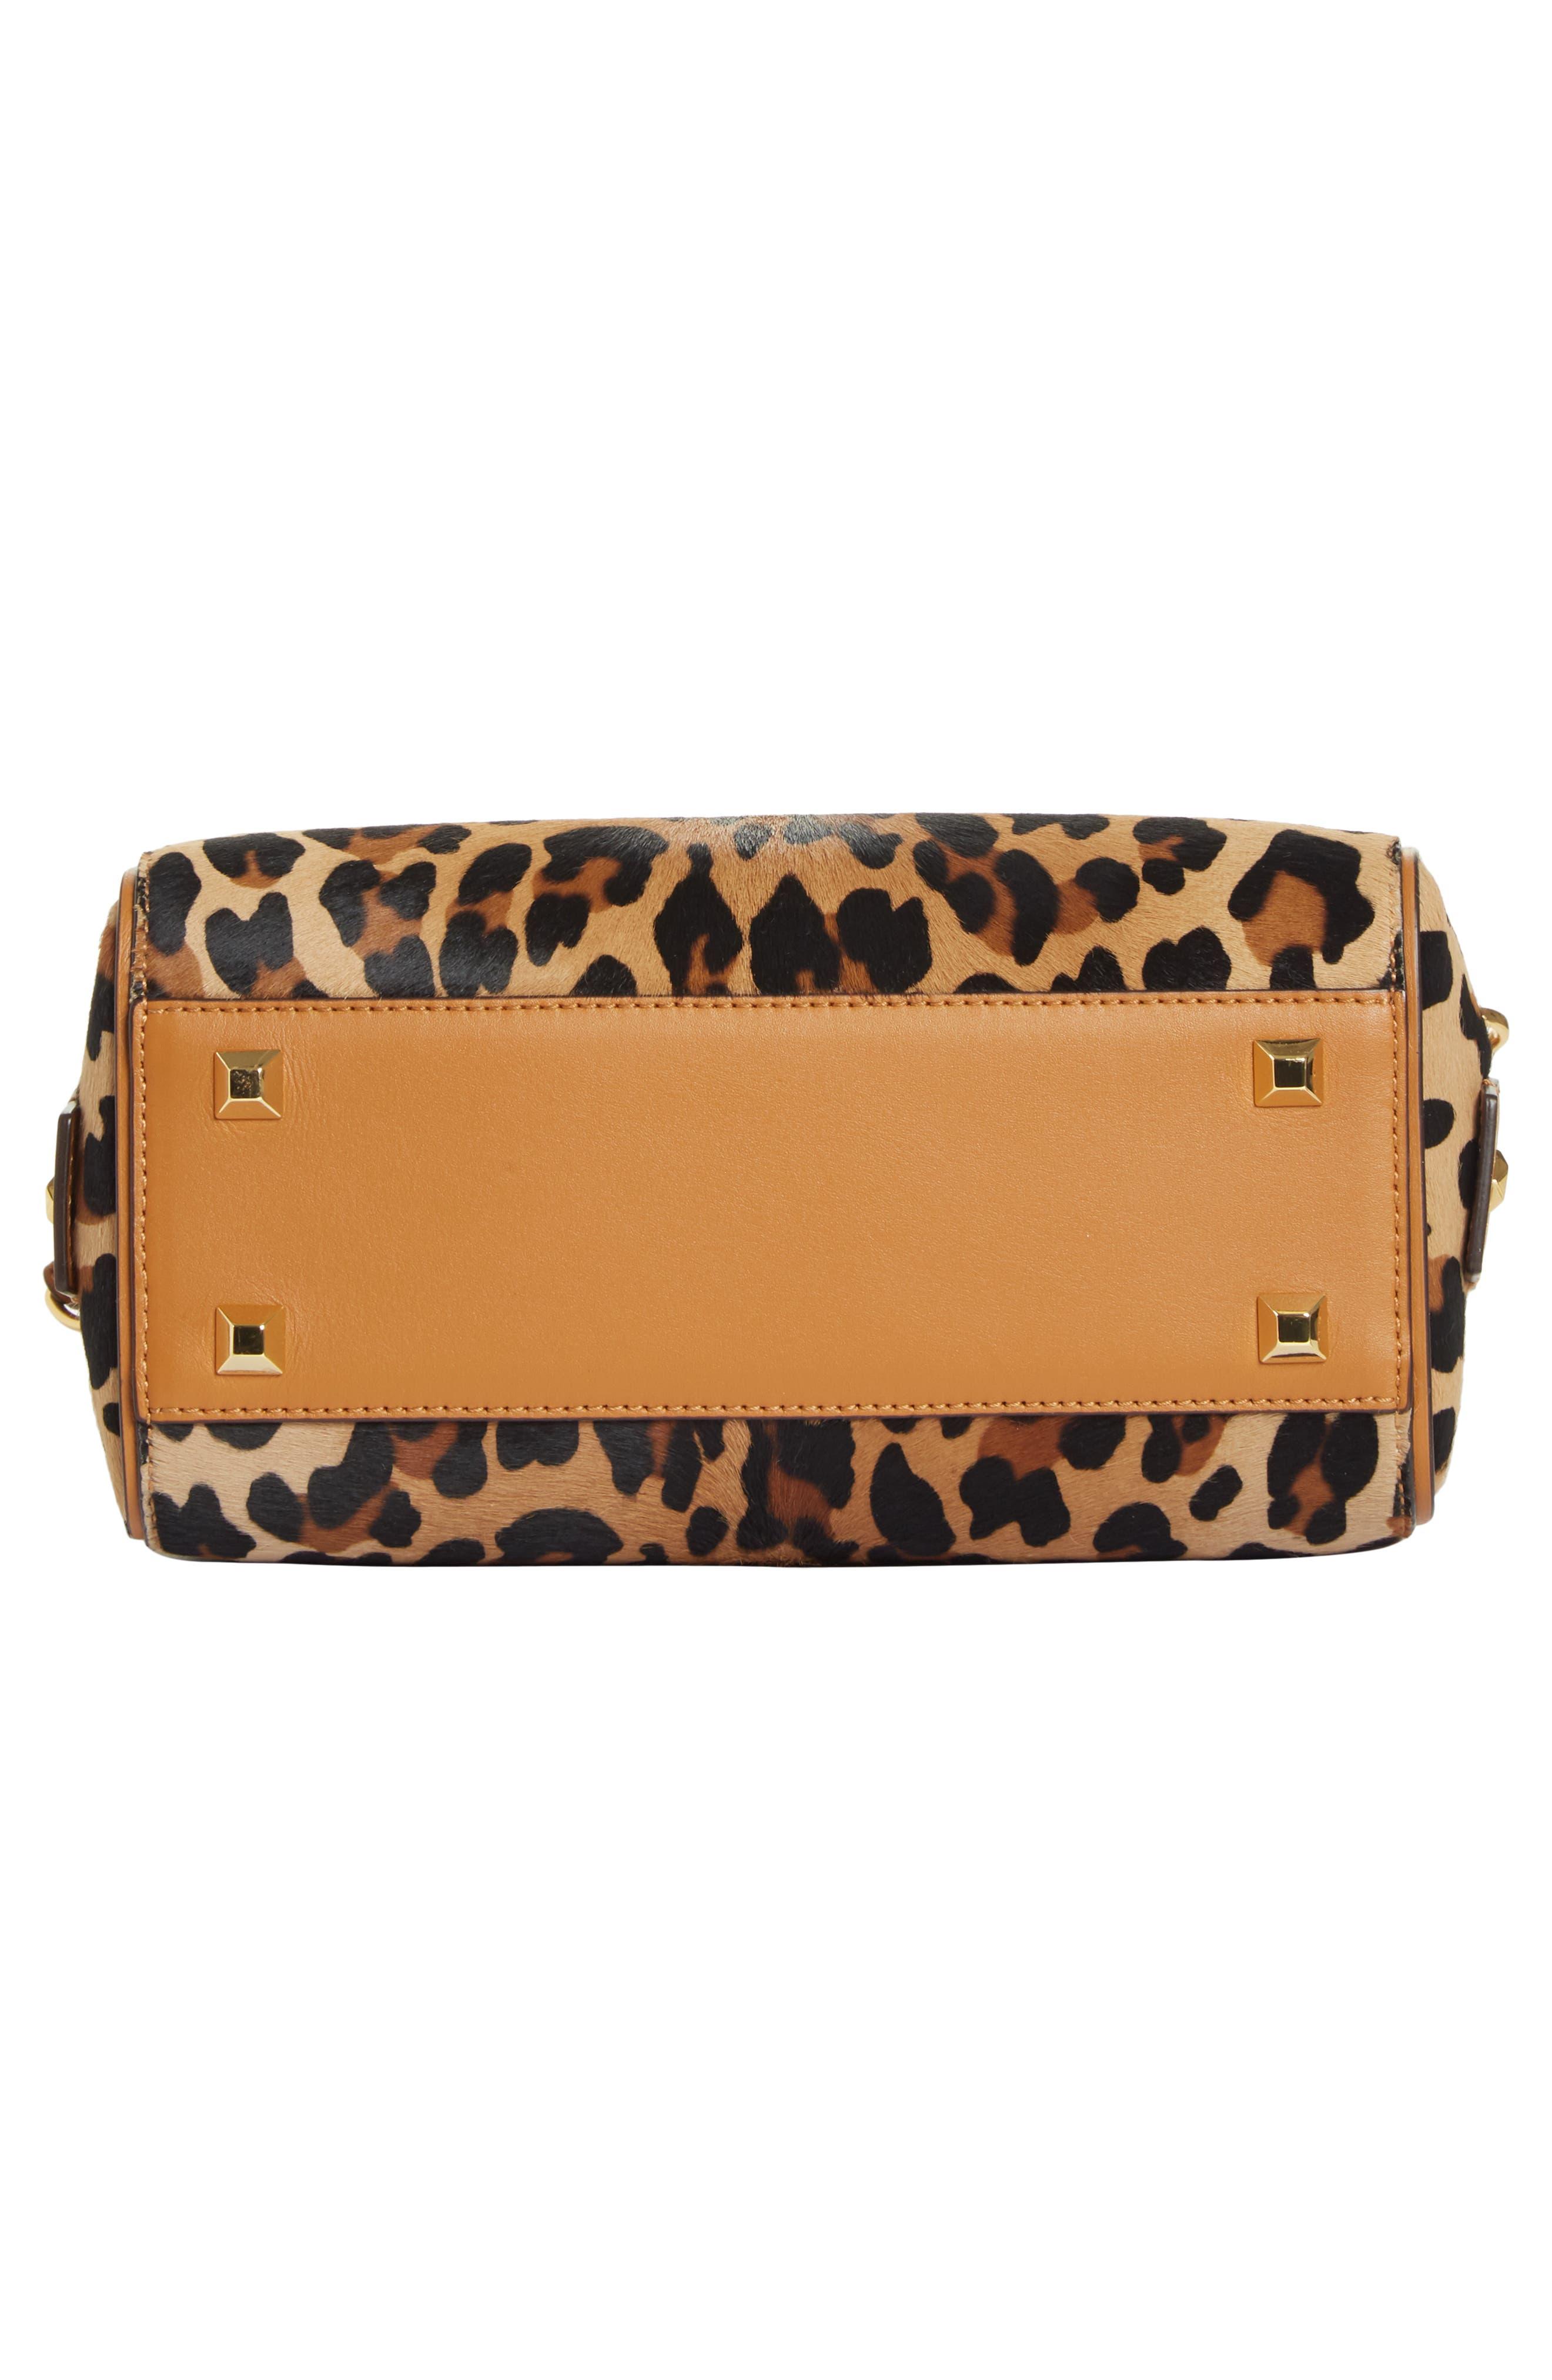 MCM,                             Small Boston Leopard Calf Hair Bowler Bag,                             Alternate thumbnail 8, color,                             LEOPARD